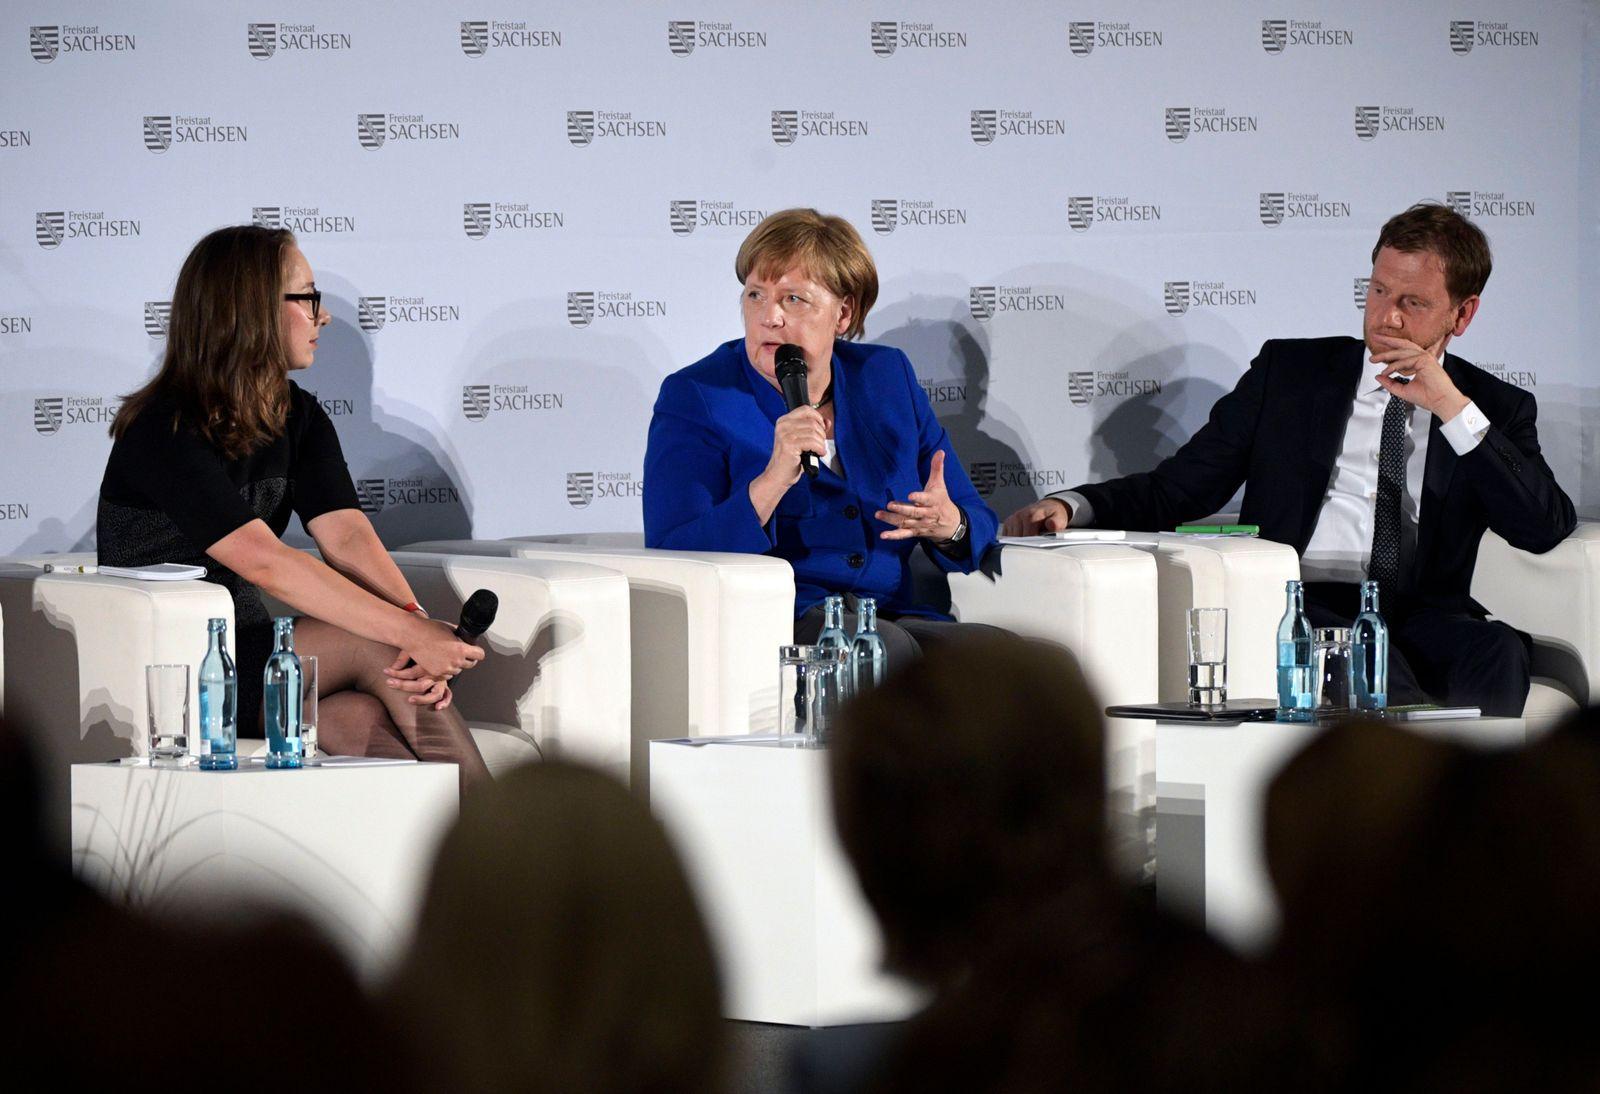 Angela Merkel in Sachsen